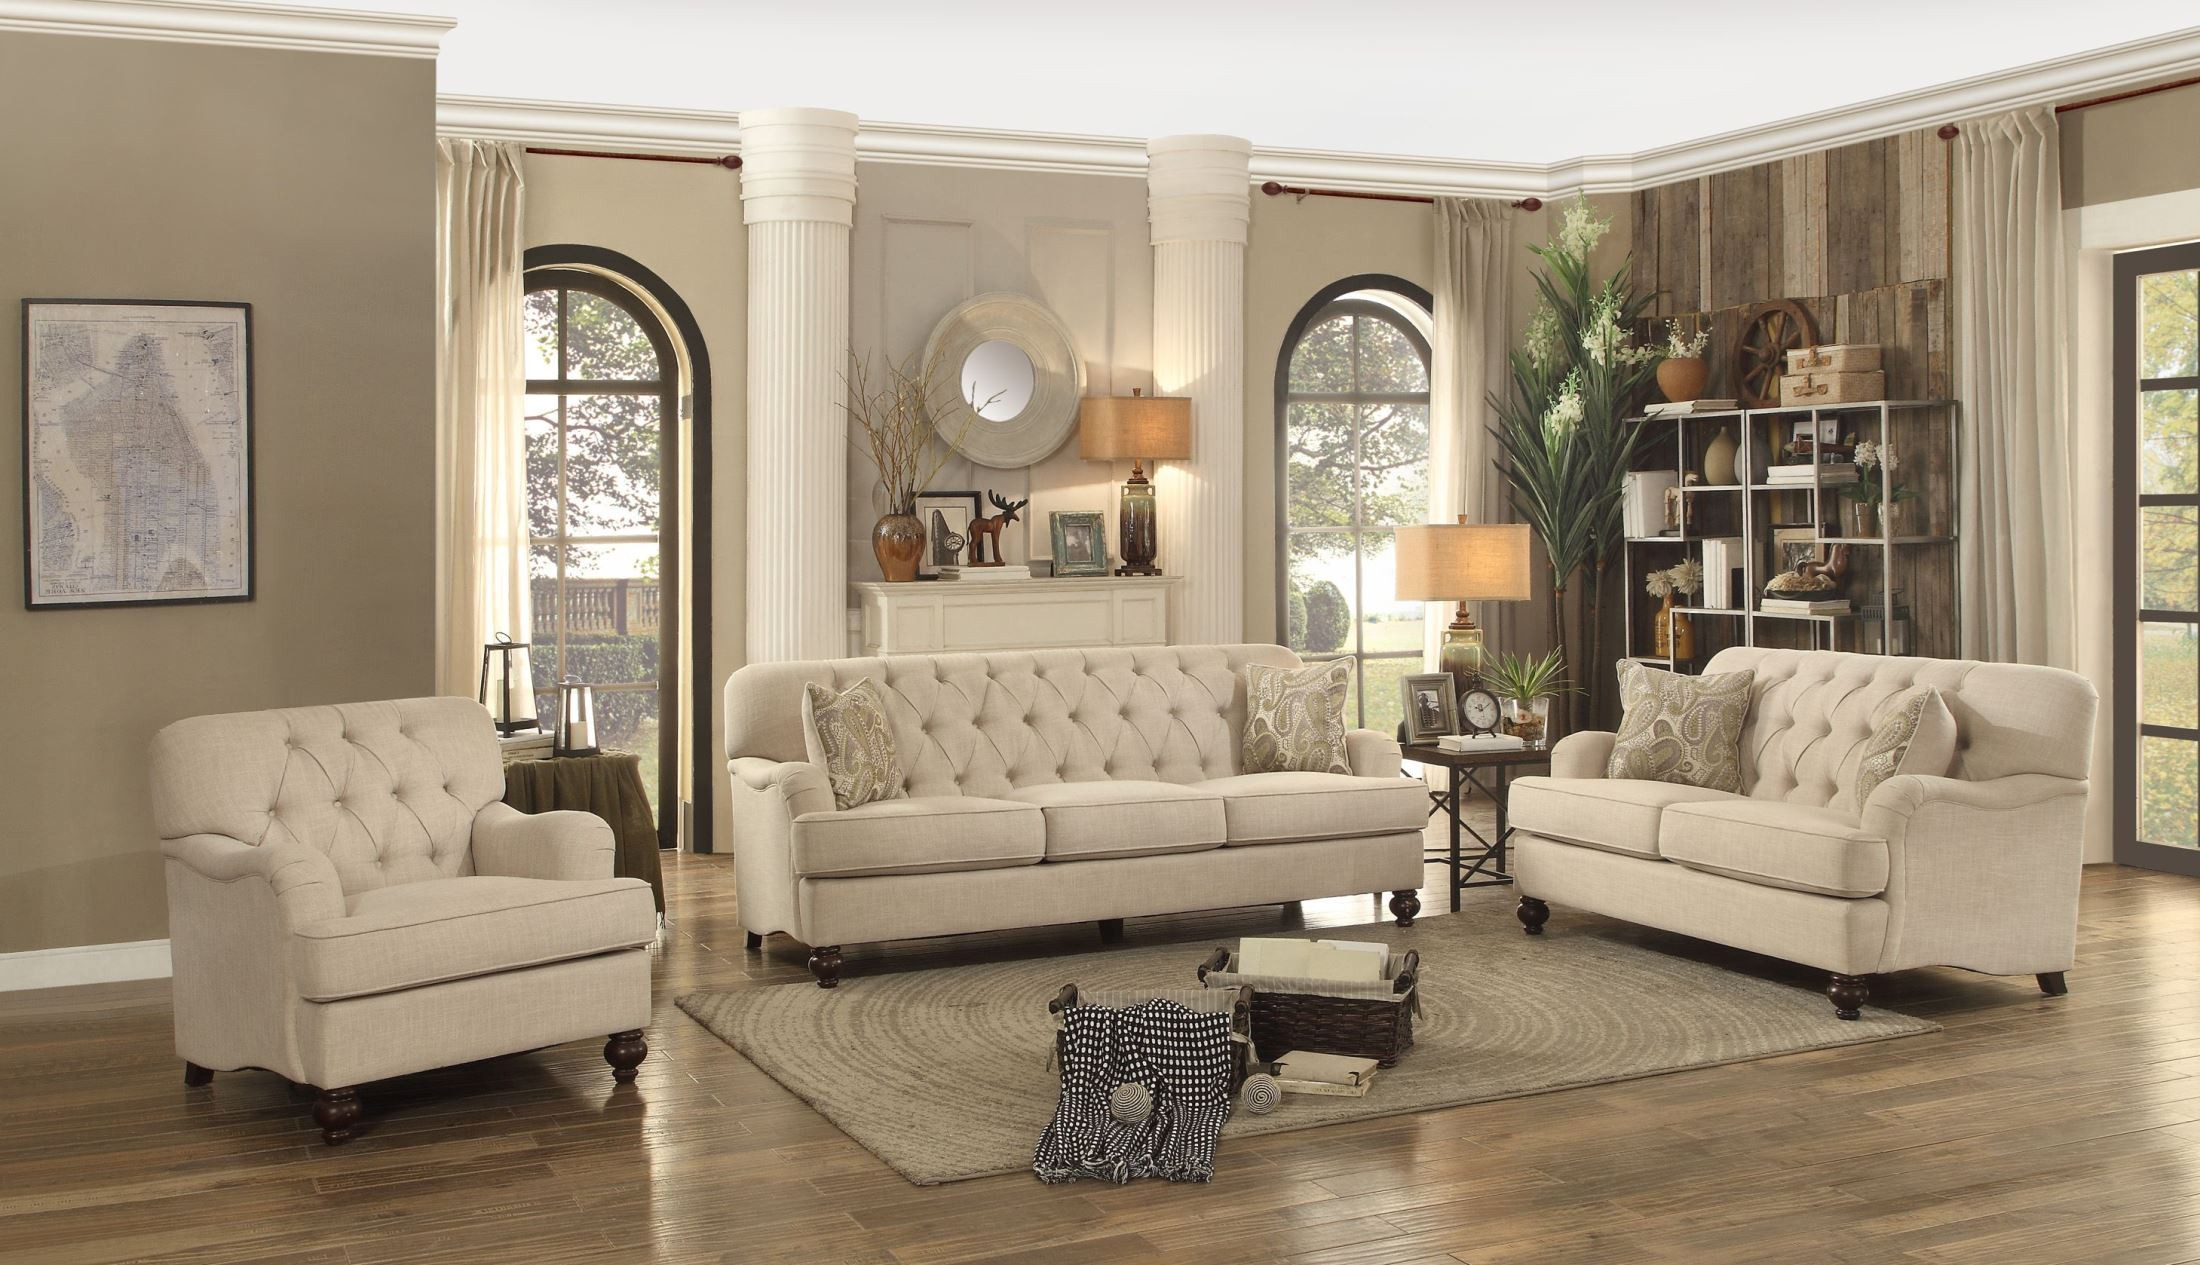 Rooms: Clemencia Natural Tone Living Room Set